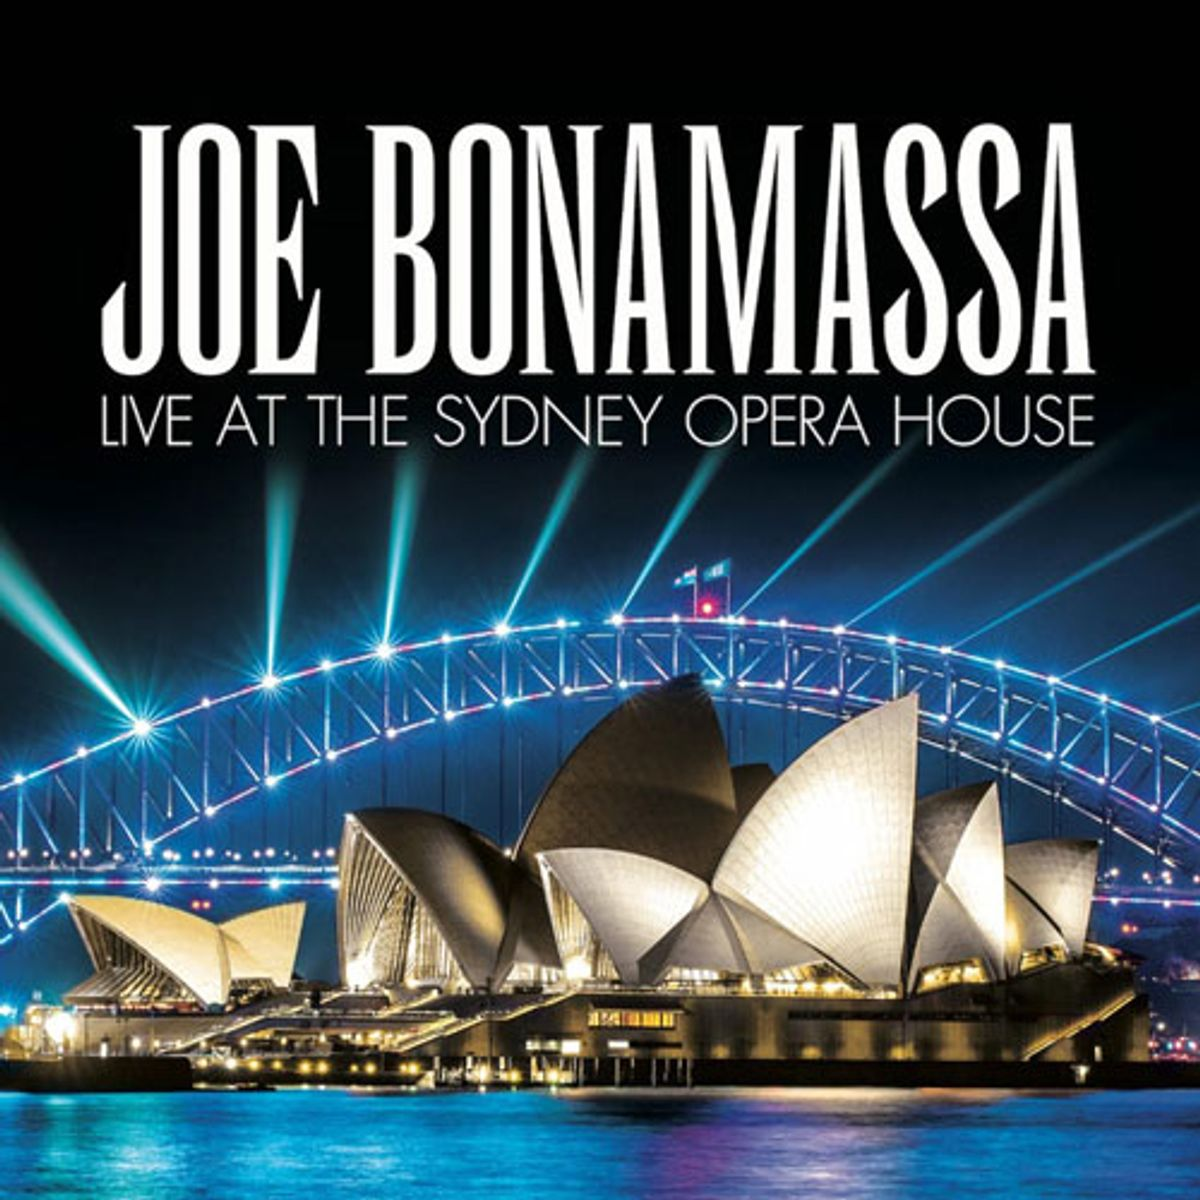 Joe Bonamassa Announces 'Live at the Sydney Opera House'